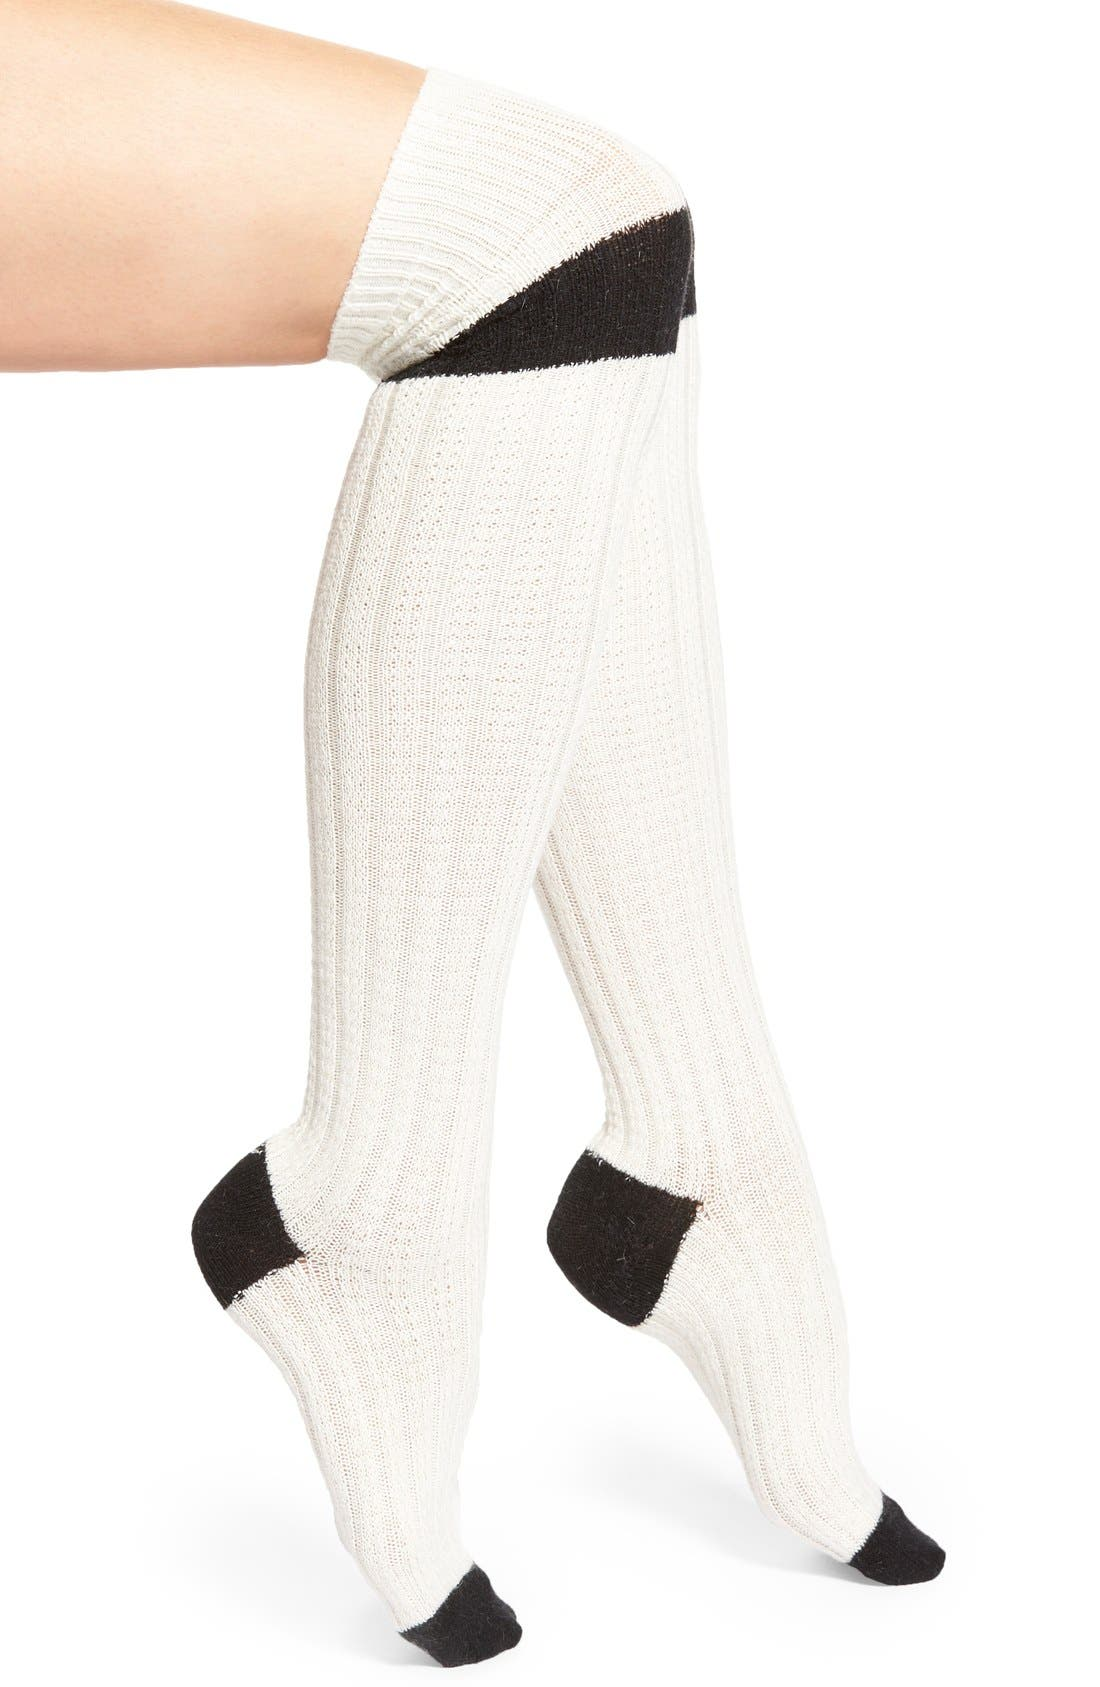 STANCE 'Gemini' Over the Knee Socks, Main, color, 270